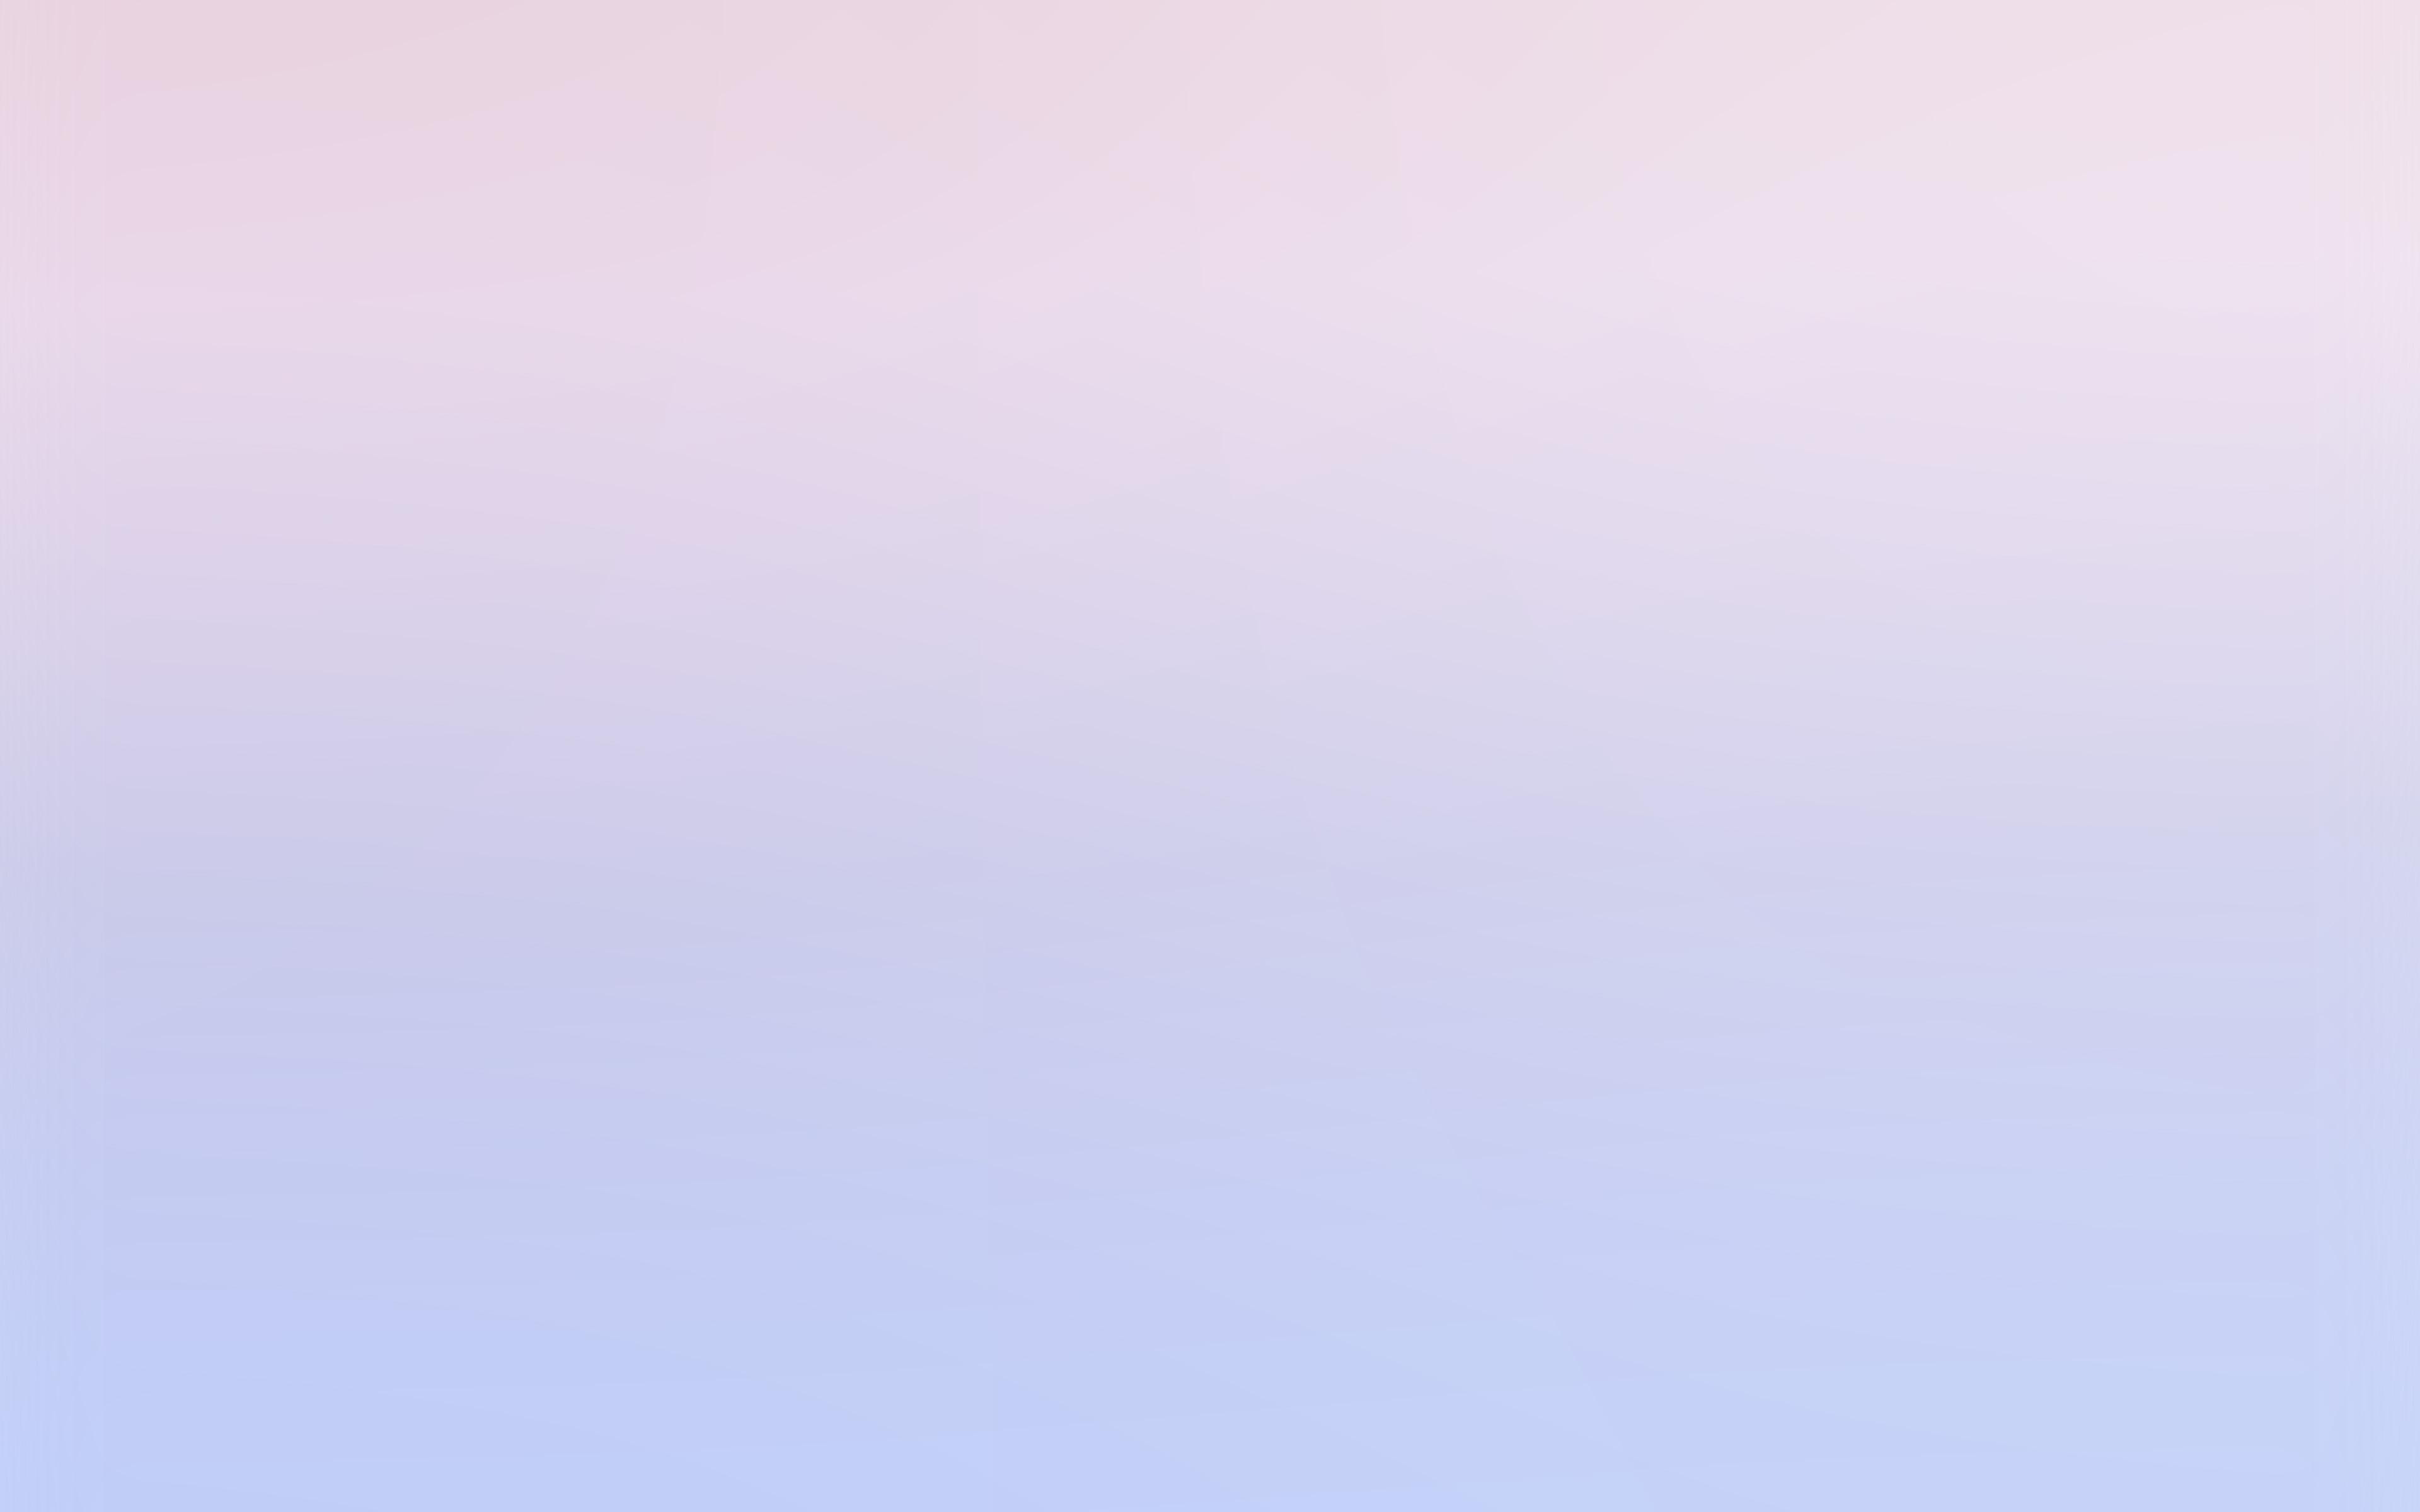 Fall Hd Wallpaper Iphone Sm55 Pastel Blue Red Morning Blur Gradation Wallpaper